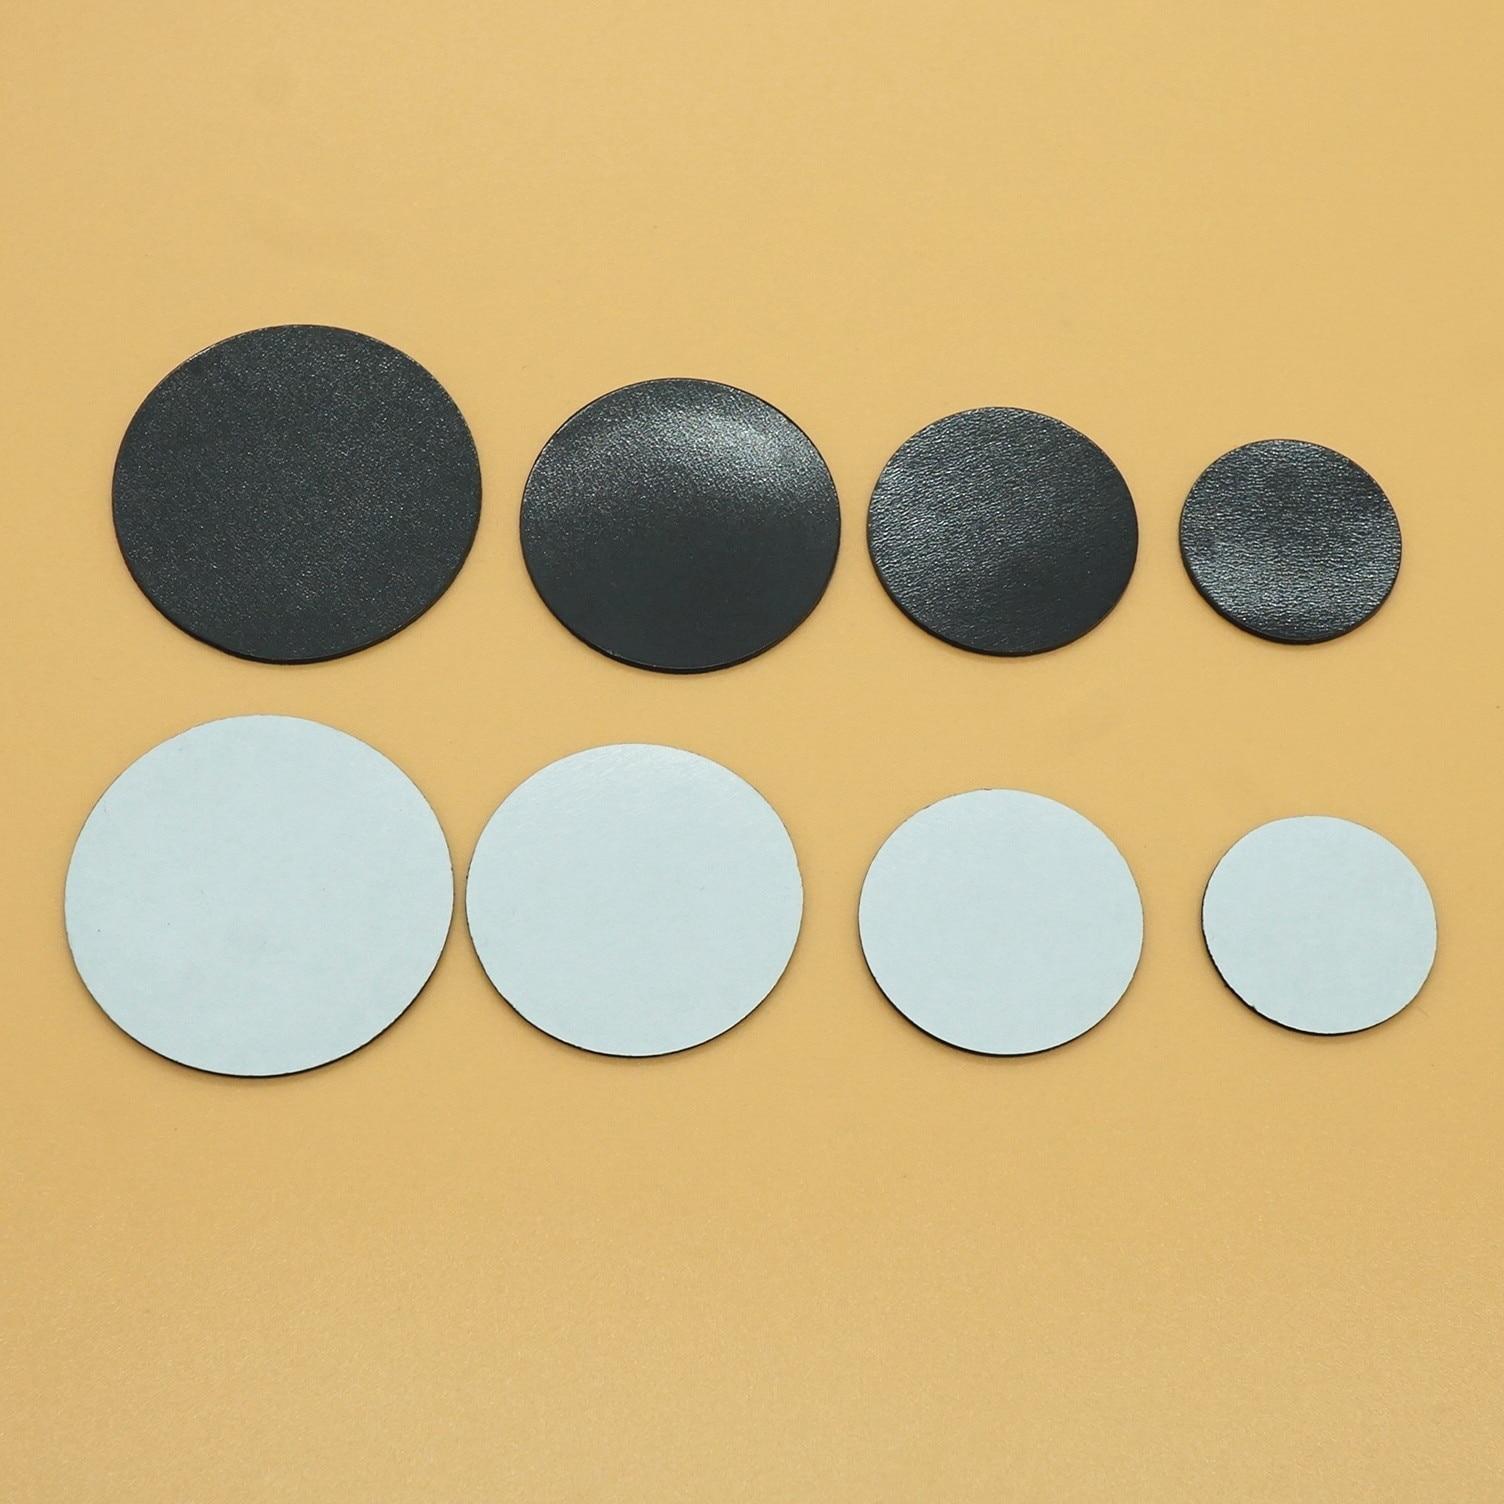 20PCS 23mm 28mm 33mm 38mm Round Magnet Rubber Fridge Magnetic Sticker Fit Glass Cabochon Refrigerator Blackboard DIY Crafts